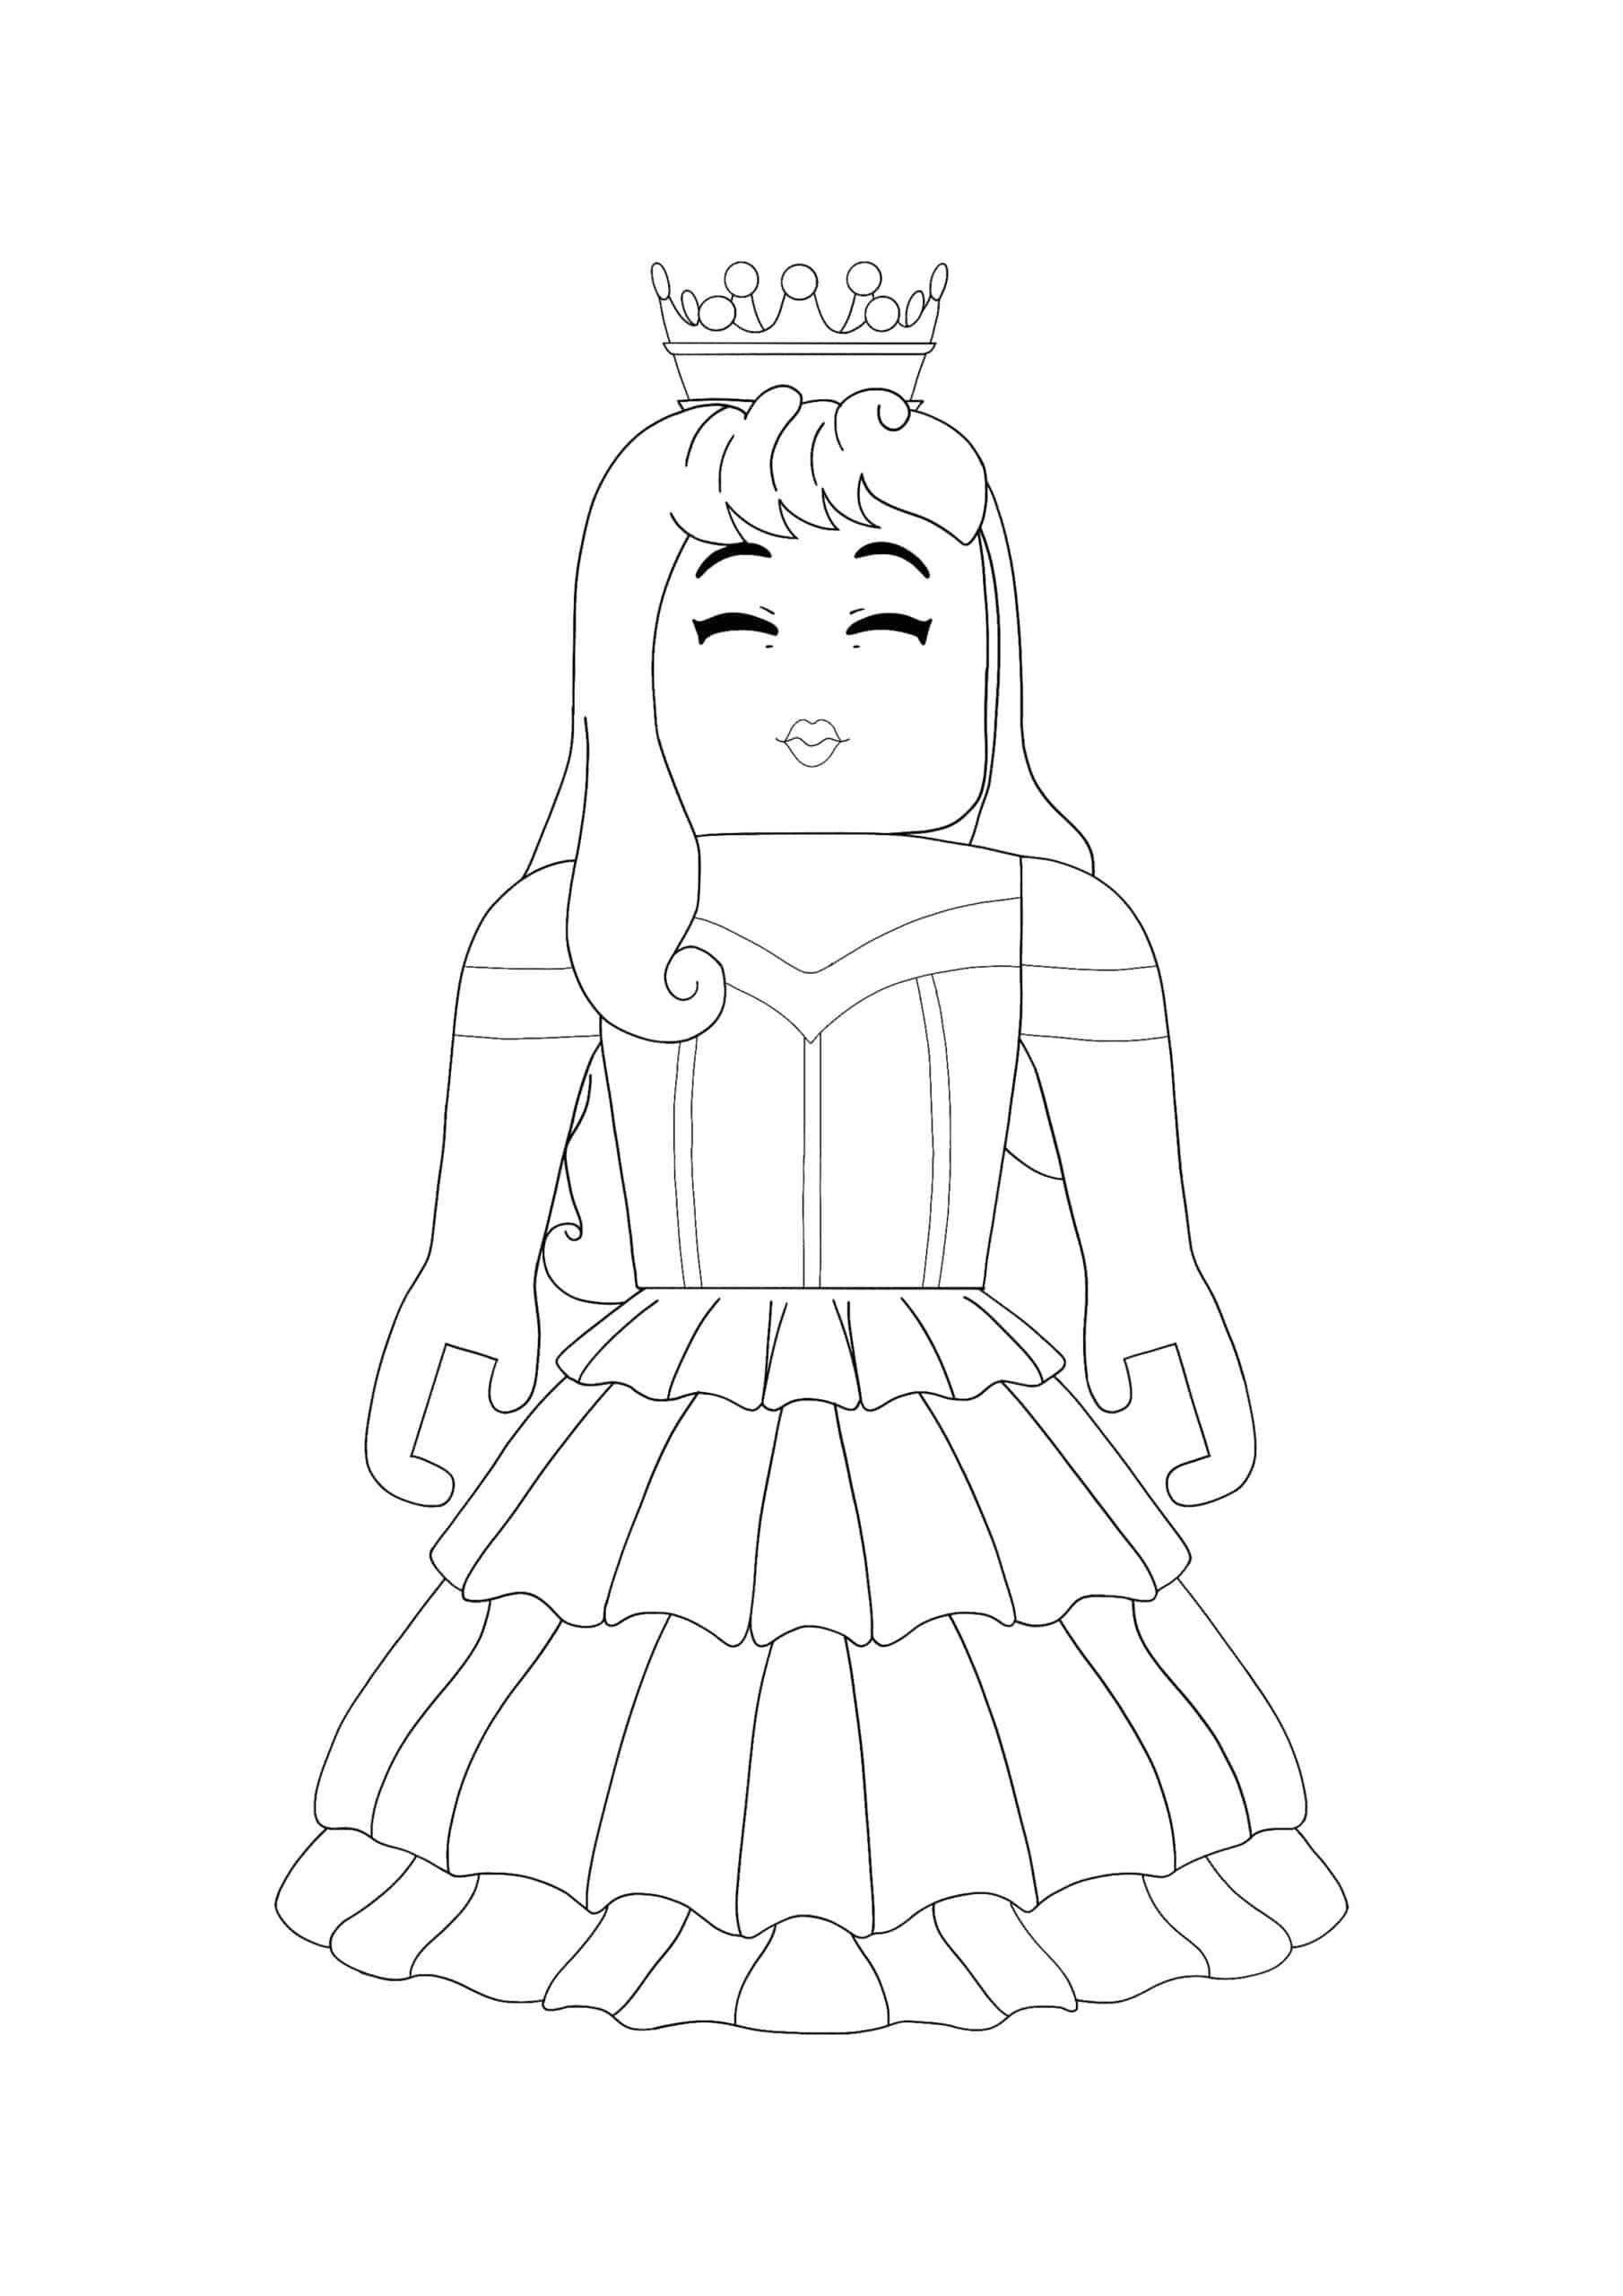 Roblox Princess coloring page